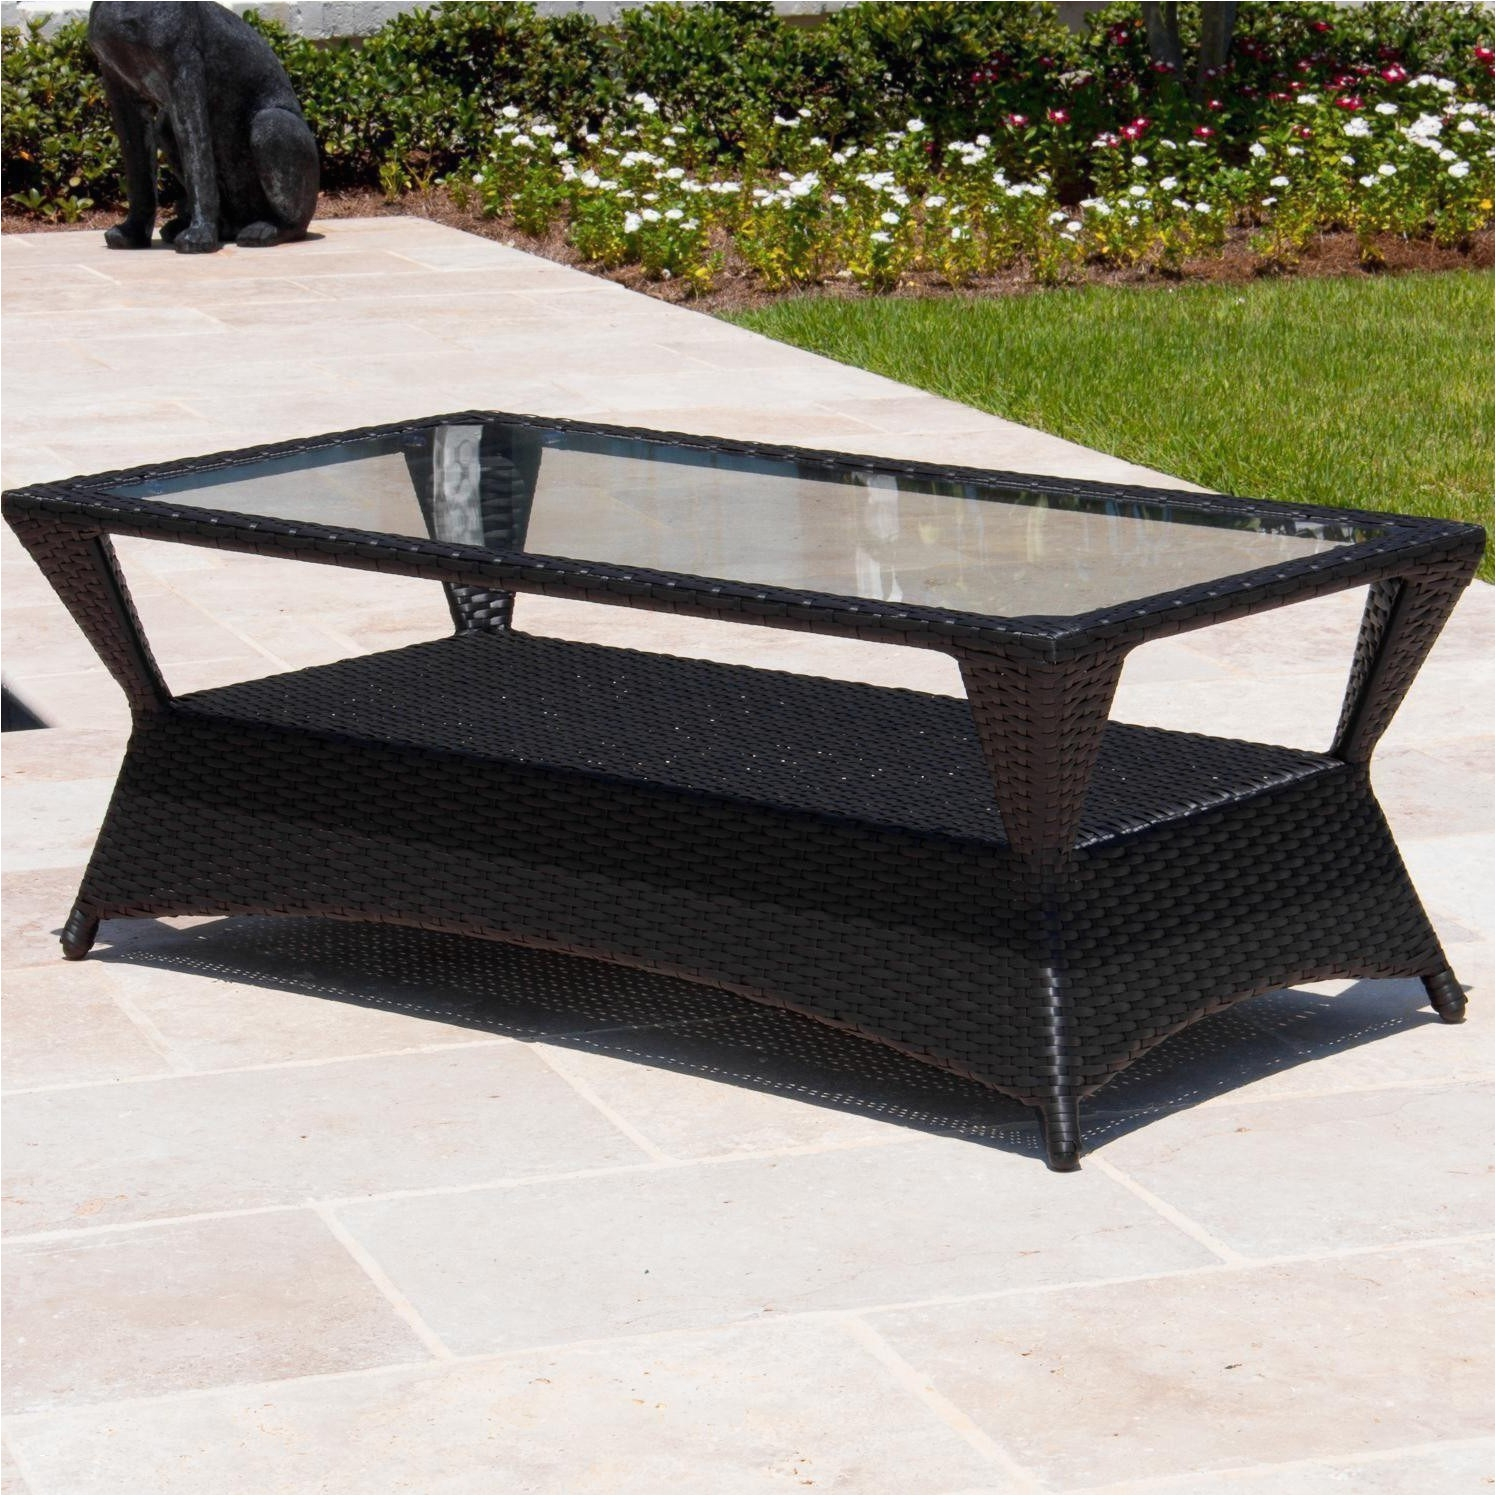 patio bench walmart fresh walmart aluminum patio furniture of 17 new patio bench walmart classic